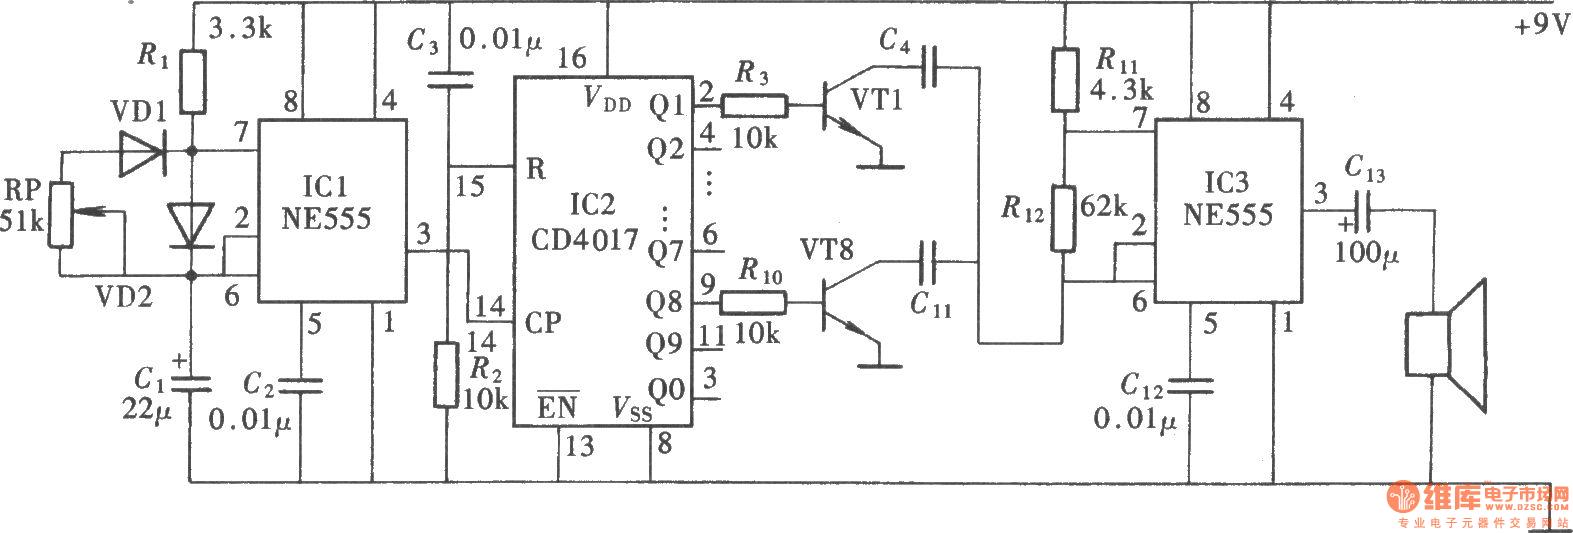 Special Sound Audio Oscillator Circuitne555cd4017 Http Wwwseekiccom Circuitdiagram Amplifiercircuit Darkcurrent